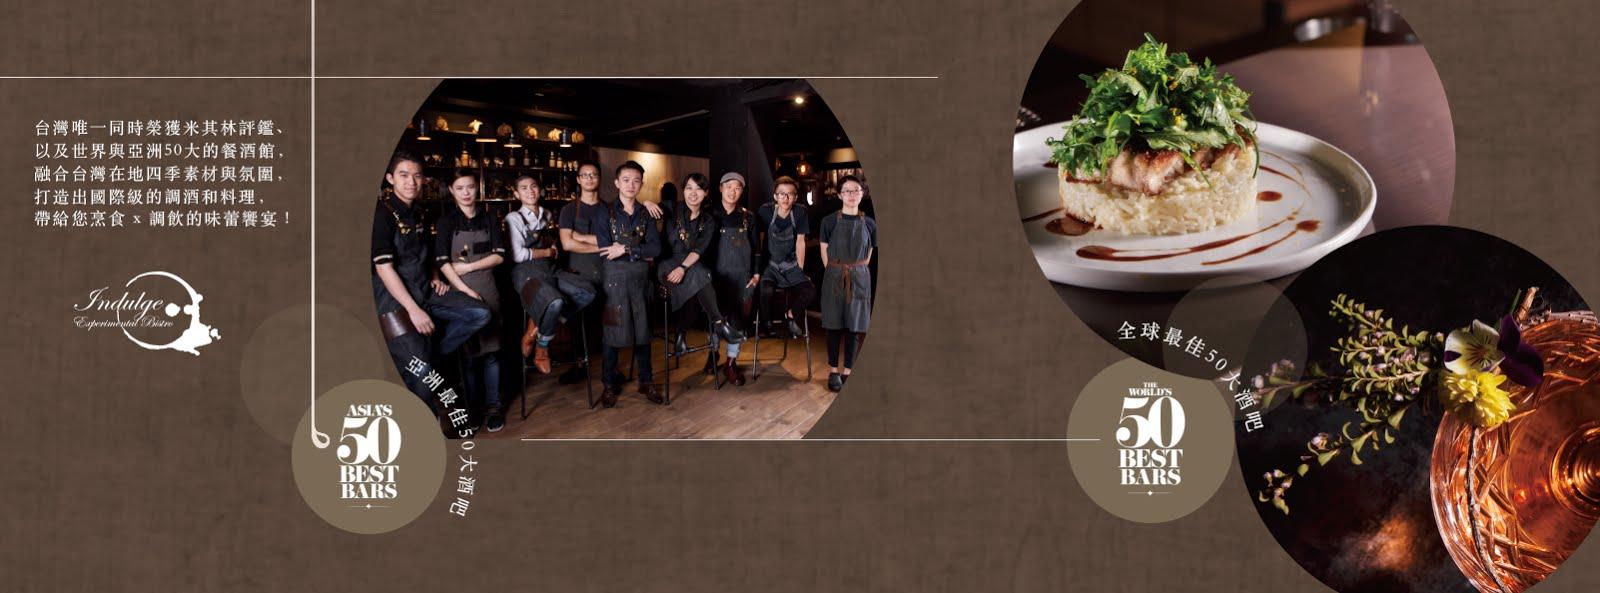 INDULGE 實驗創新餐酒館